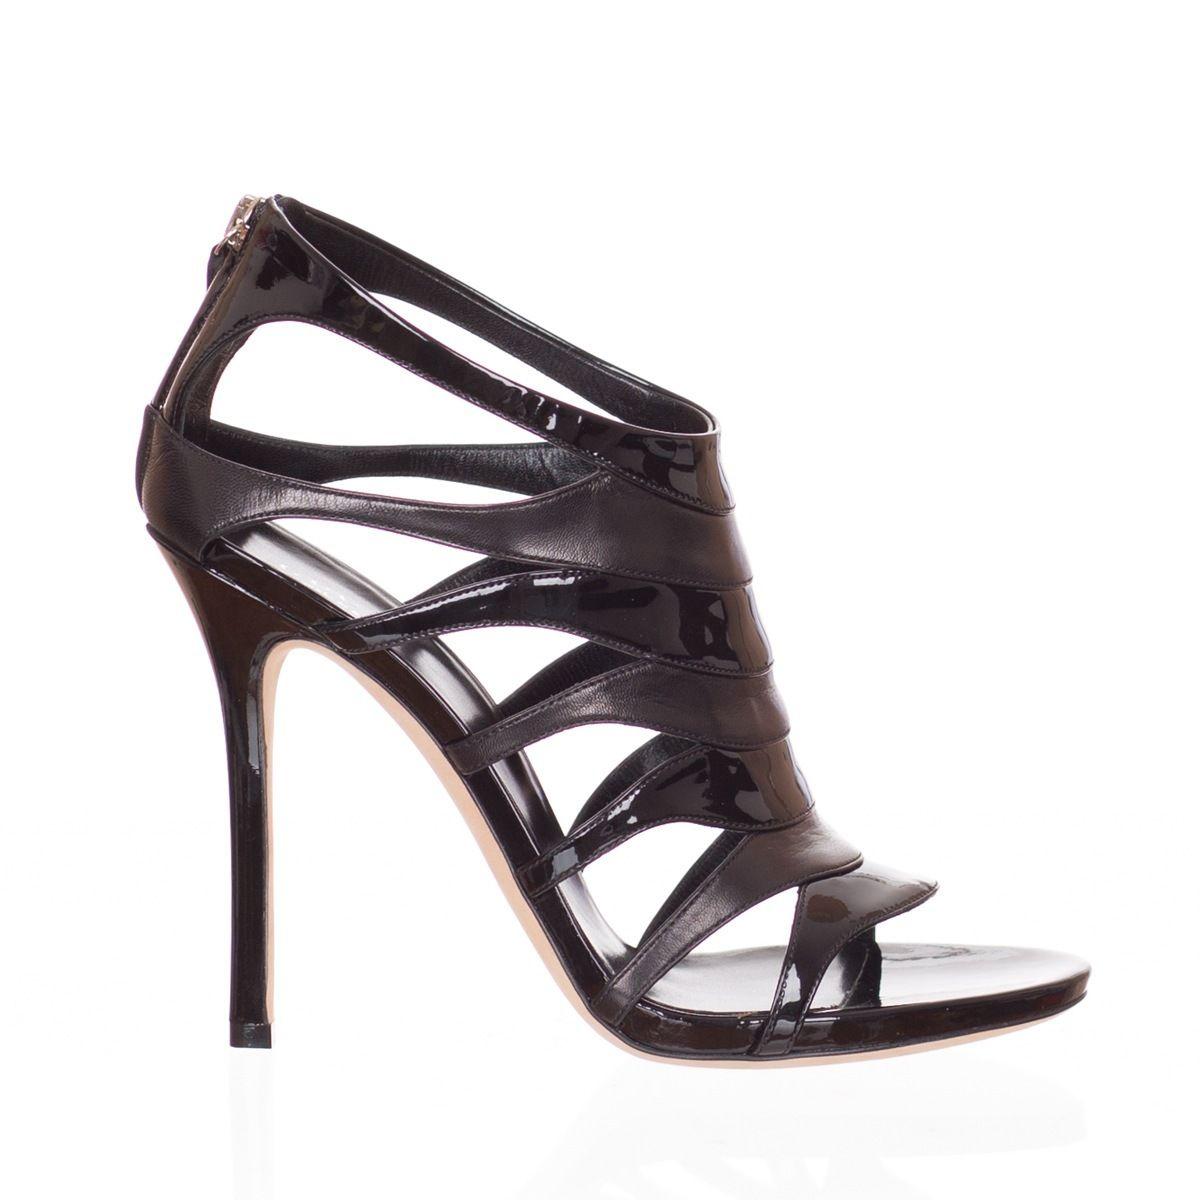 Gucci Women s Black Leather Open Toe Heels Shoes Size US 8 EU 38 ecef42cda